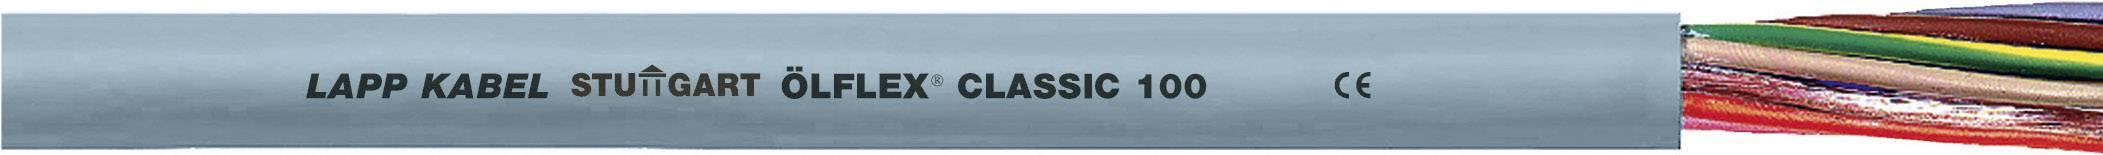 Kabel LappKabel Ölflex CLASSIC 100 3G25 (0010303), PVC, 23 mm, 750 V, šedá, 100 m